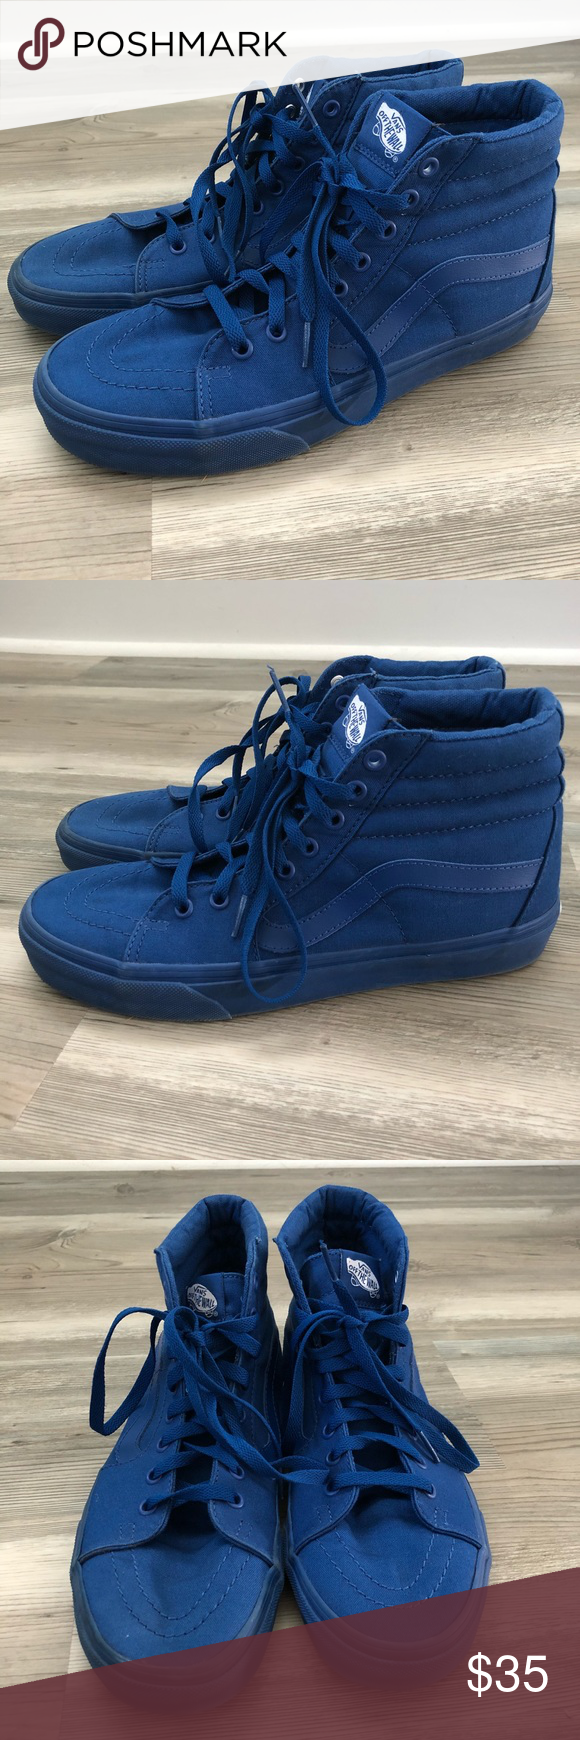 0bb96e4e99 Vans solid blue high top shoes